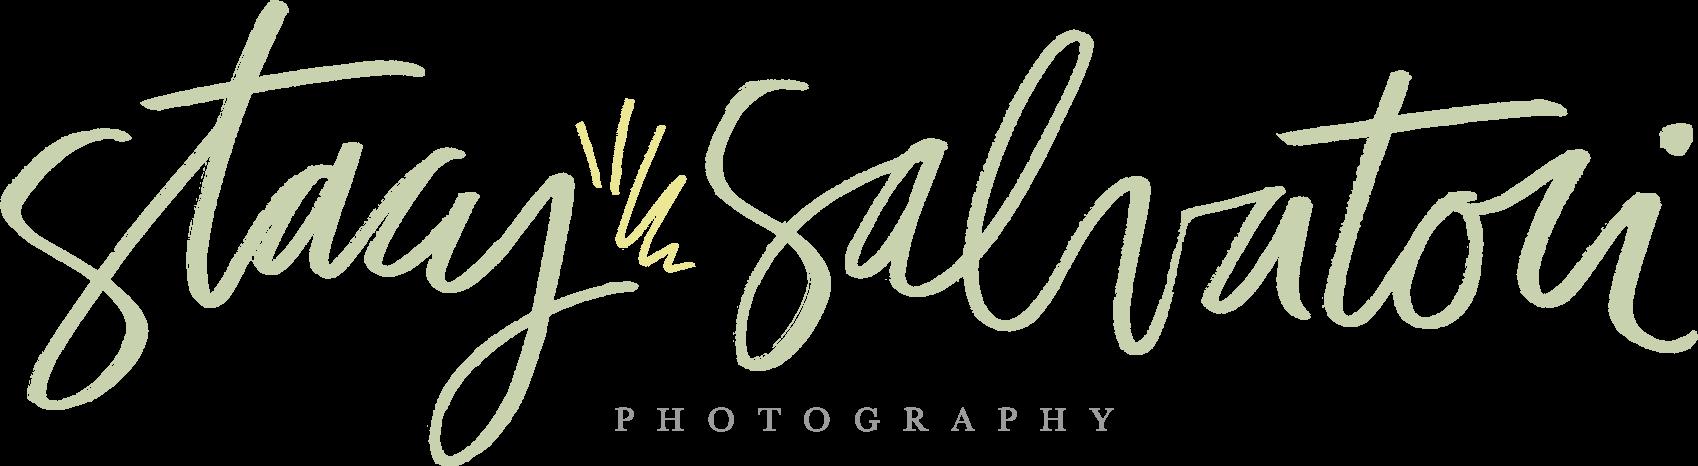 Salvatori Photography